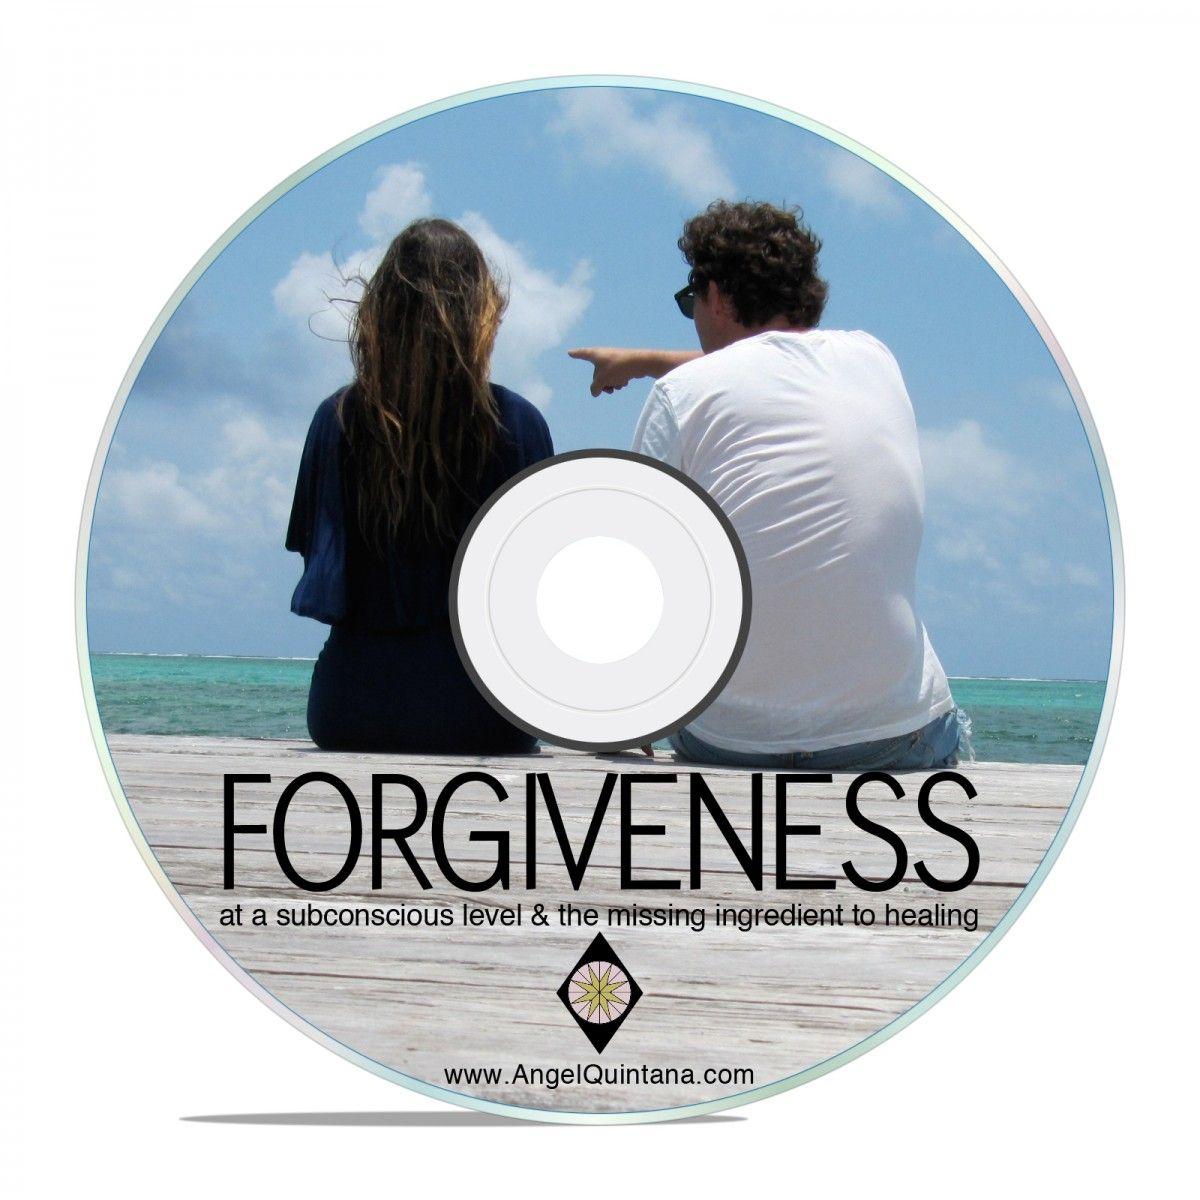 forgiveness guided imagery, #meditation ...